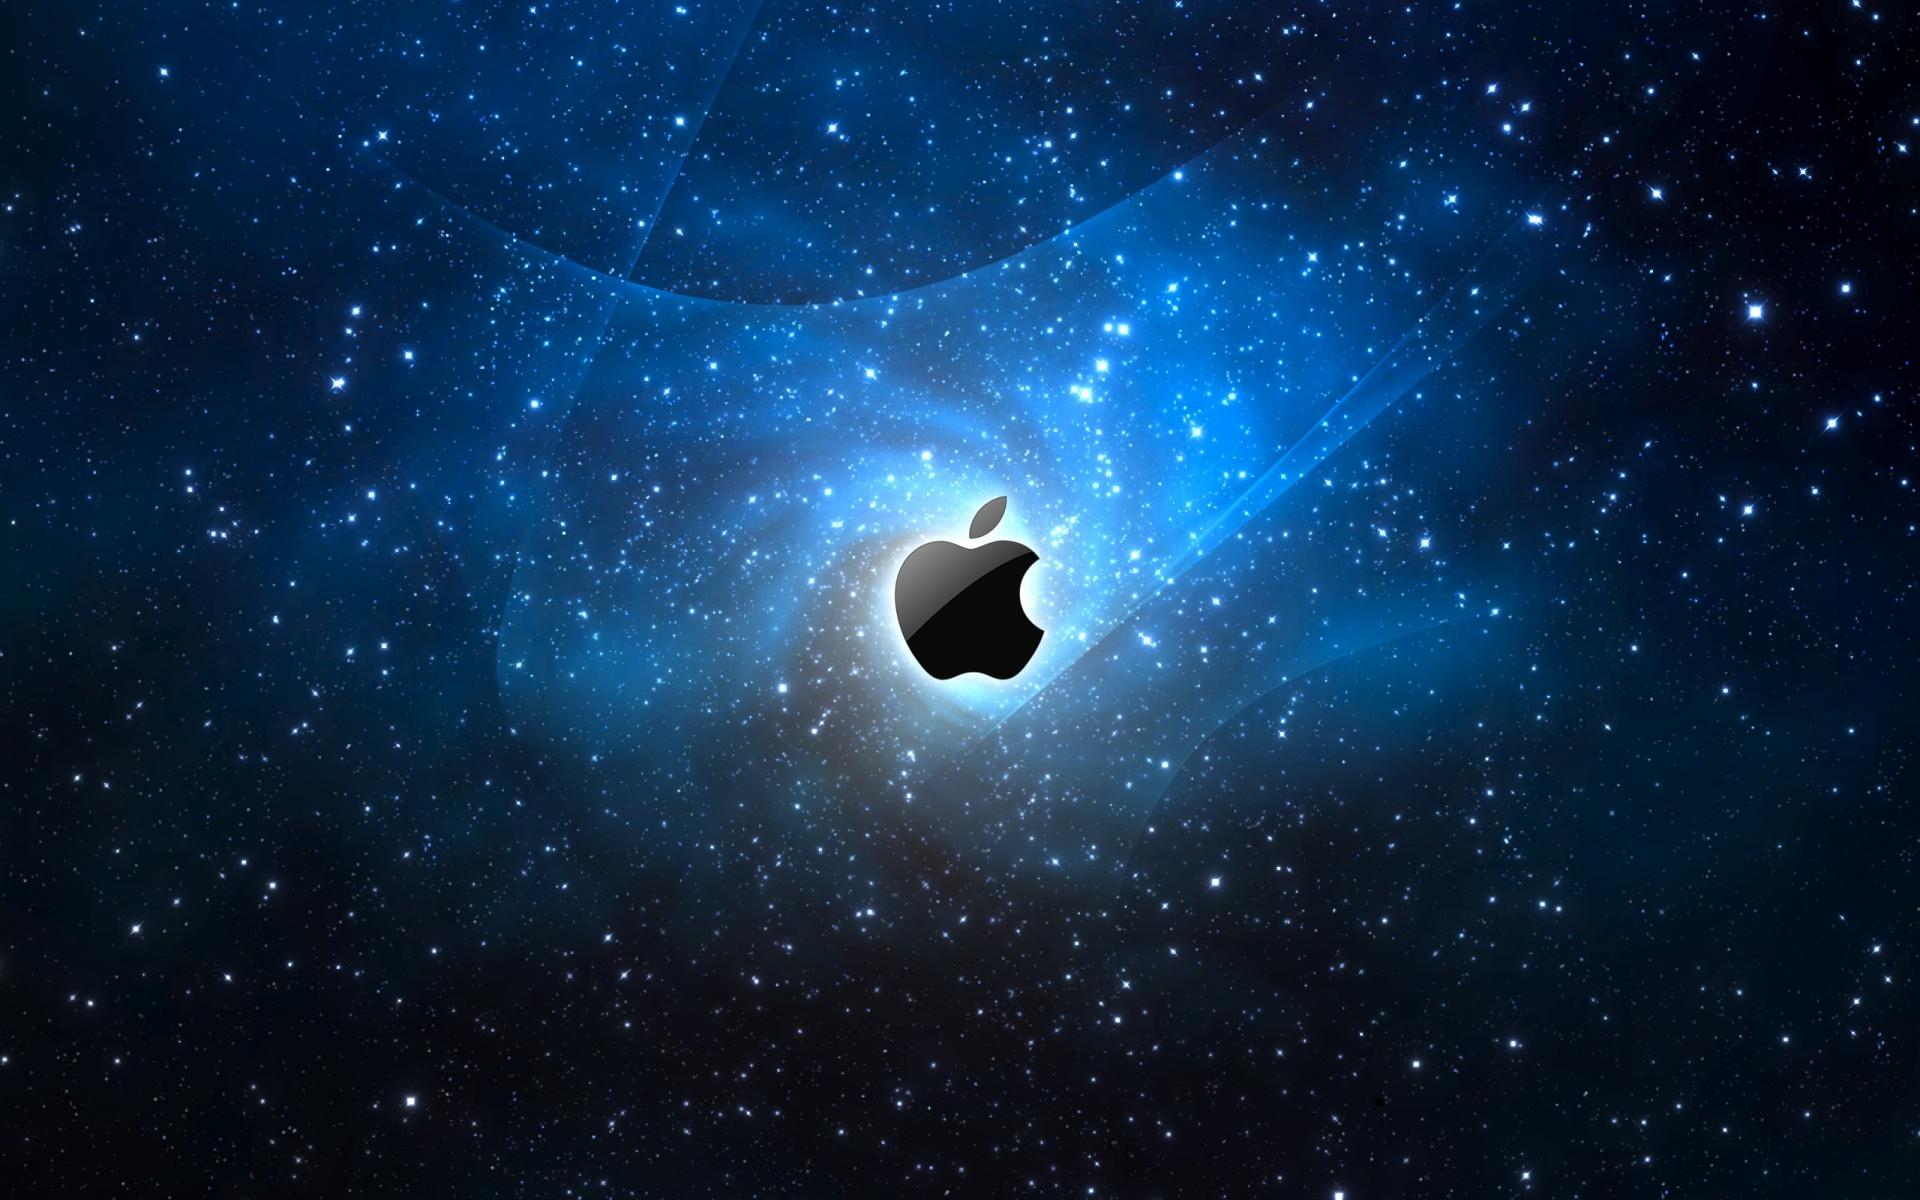 Apple Logo 6 Cool HD Wallpaper